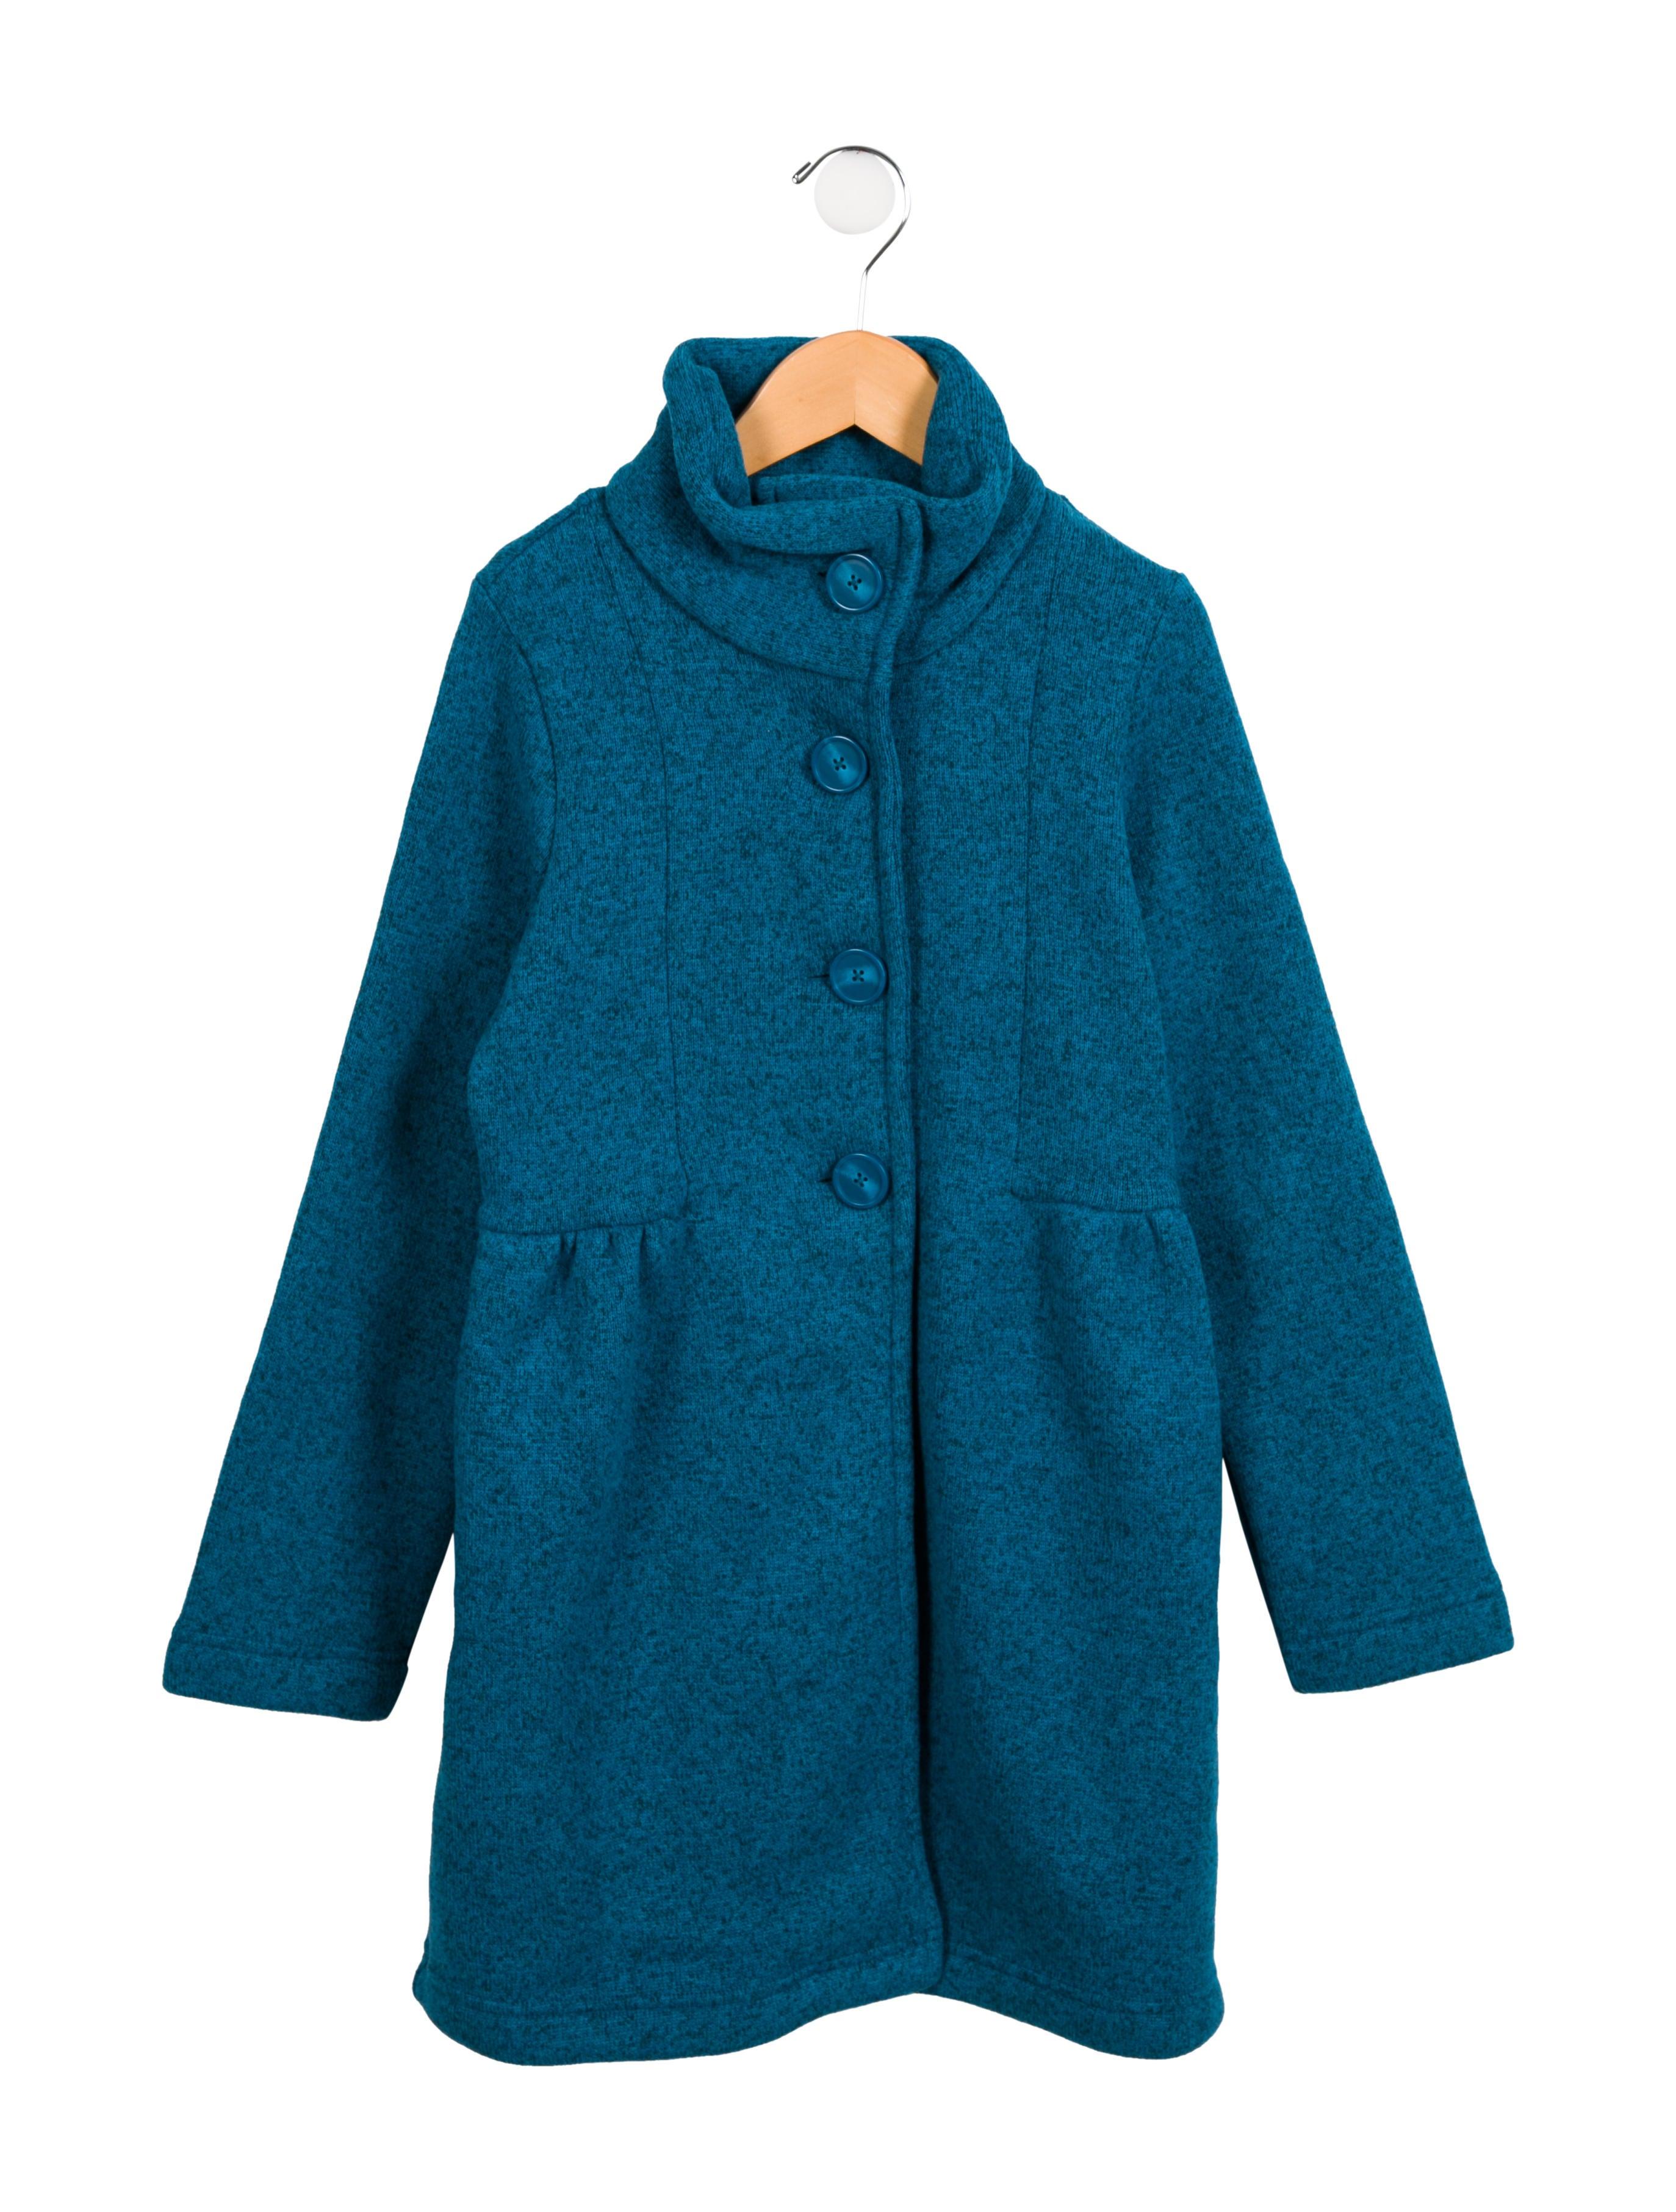 0c1baf914f3 Patagonia Girls  Better Sweater Coat w  Tags - Girls - WPATG21307 ...